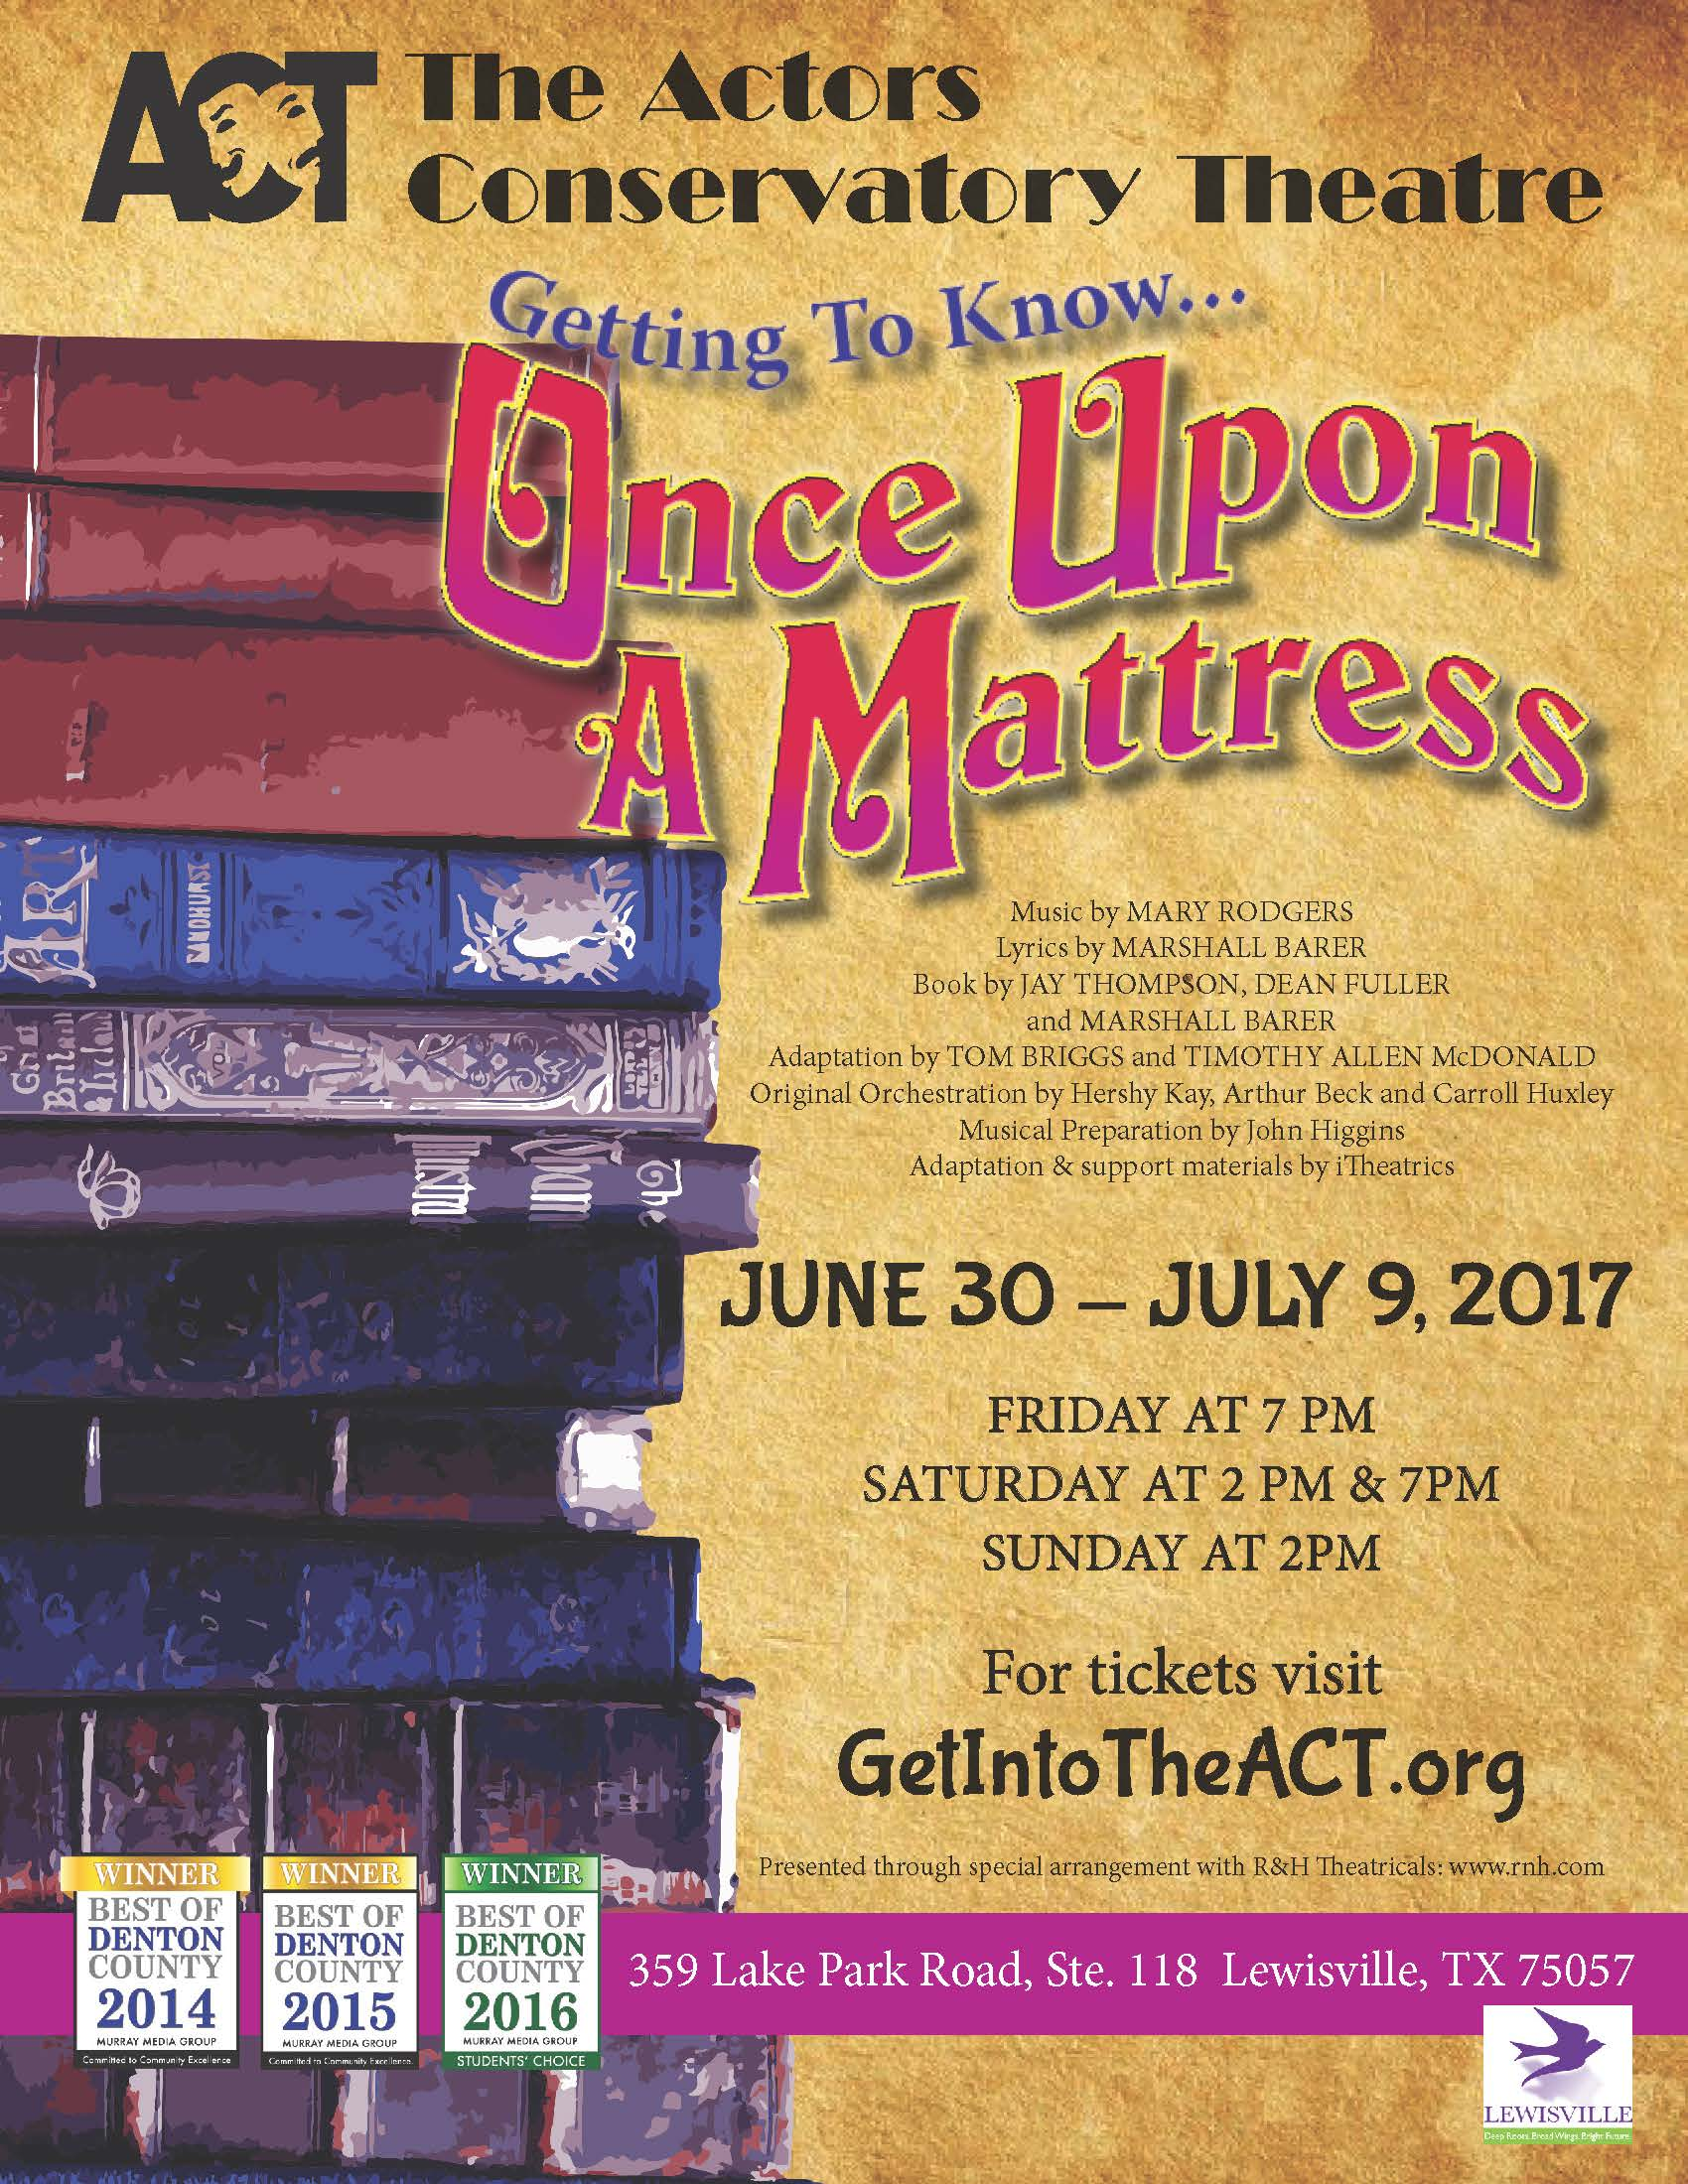 Once Upon a Mattress Show Poster - JPG